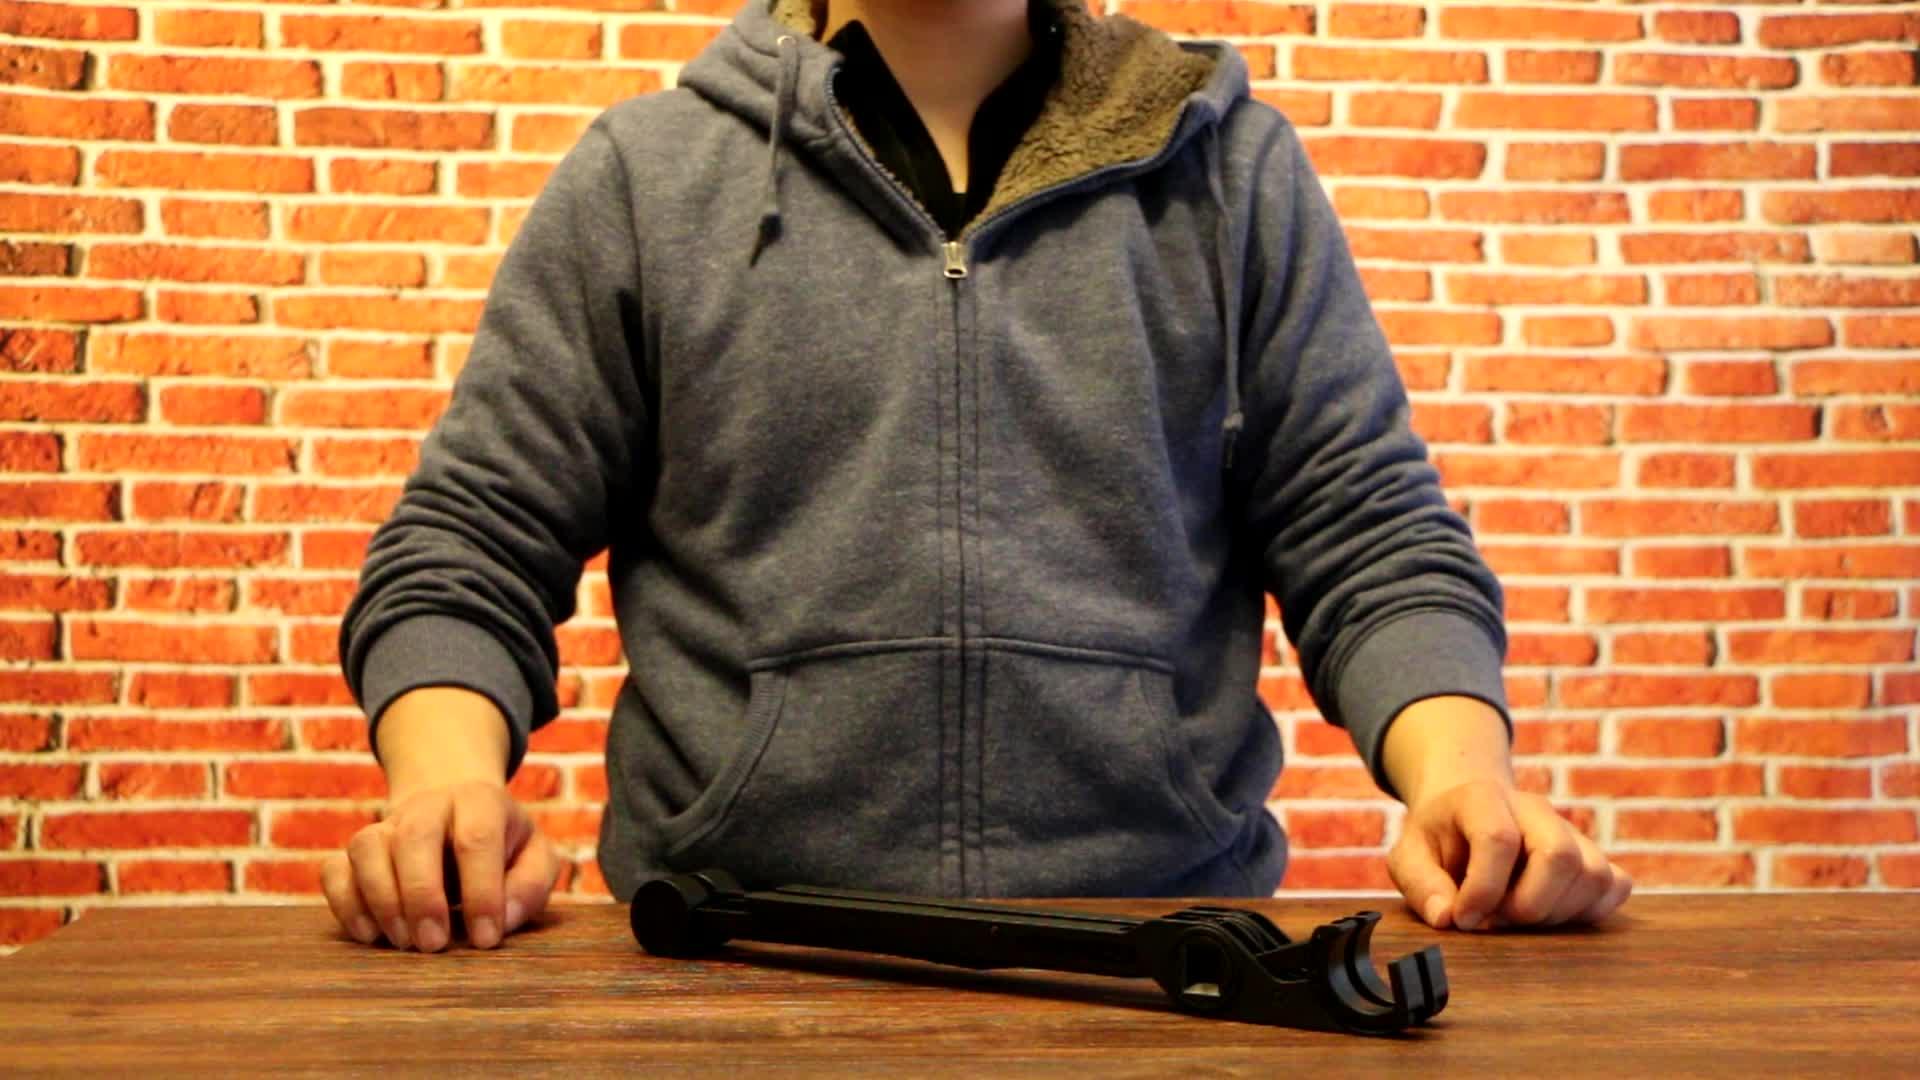 14'' portable laptop stand carbon fiber laptop stand foldable adjustable laptop support wholesale